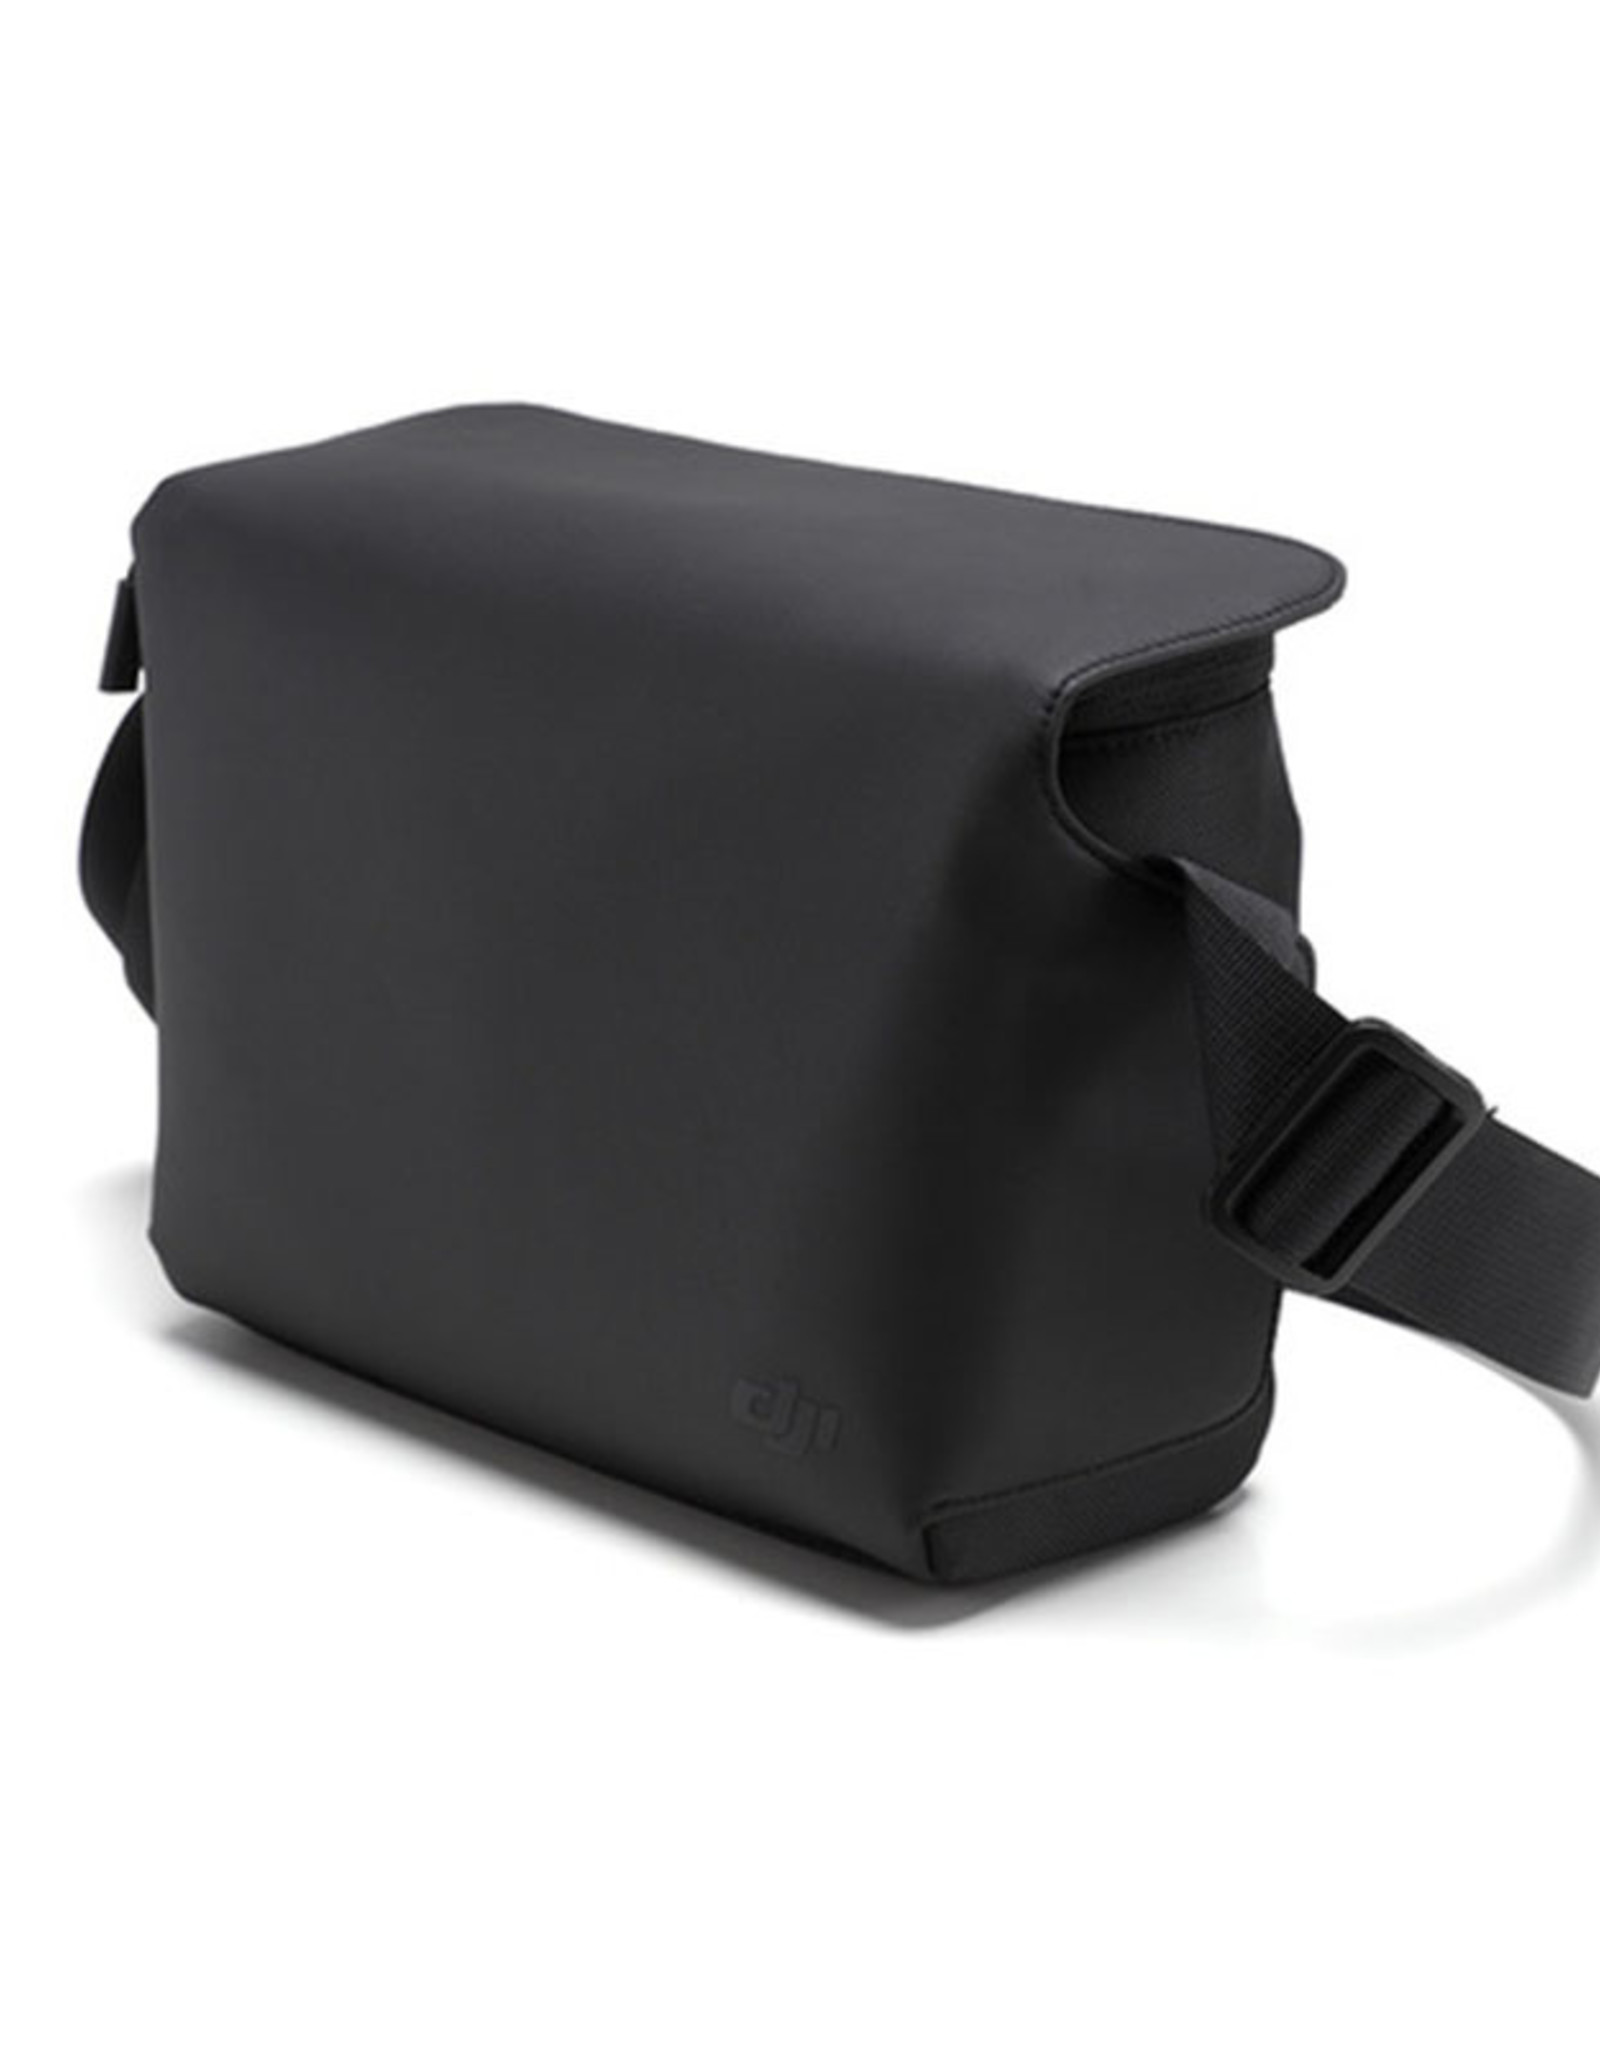 DJI Spark/Mavic Shoulder Bag